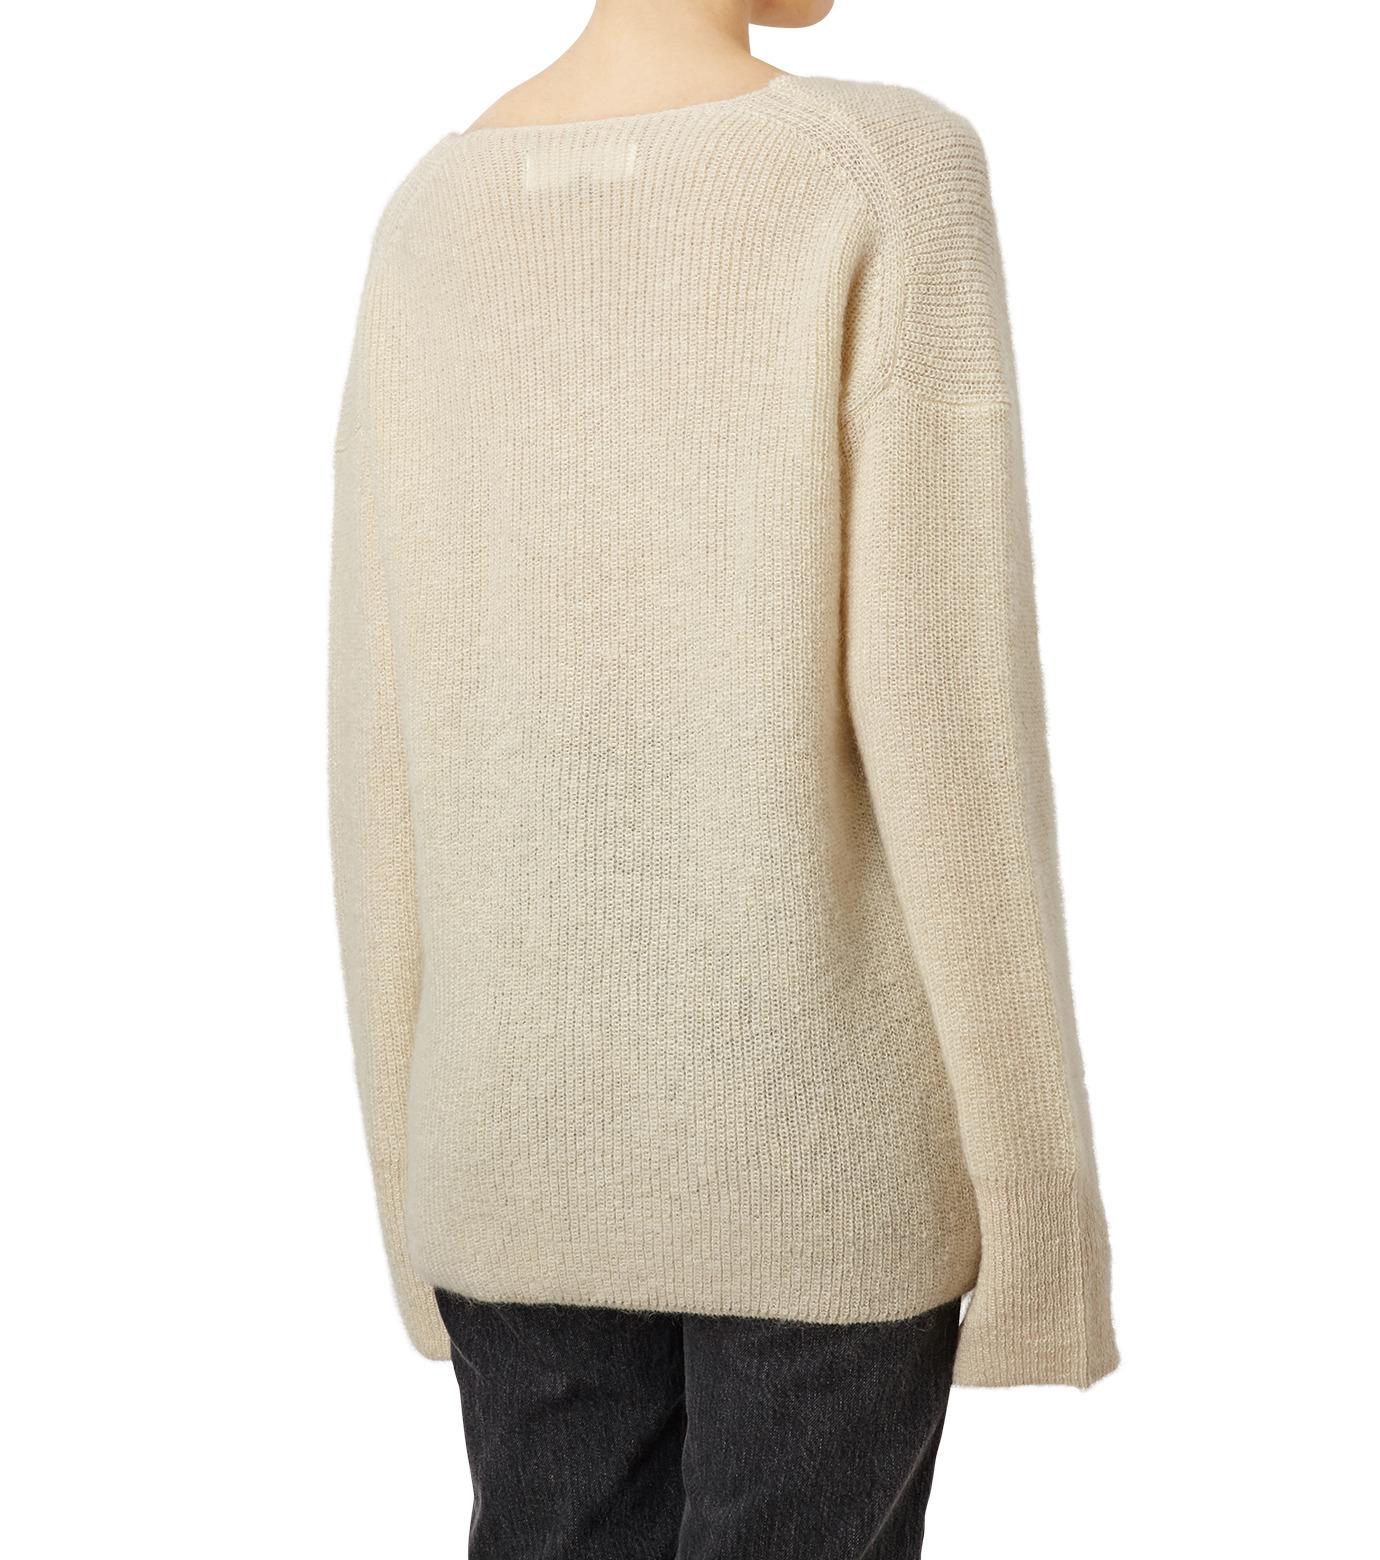 LE CIEL BLEU(ルシェルブルー)のシルクモヘヤ Vネックニット-WHITE(ニット/knit)-18A61529 拡大詳細画像2